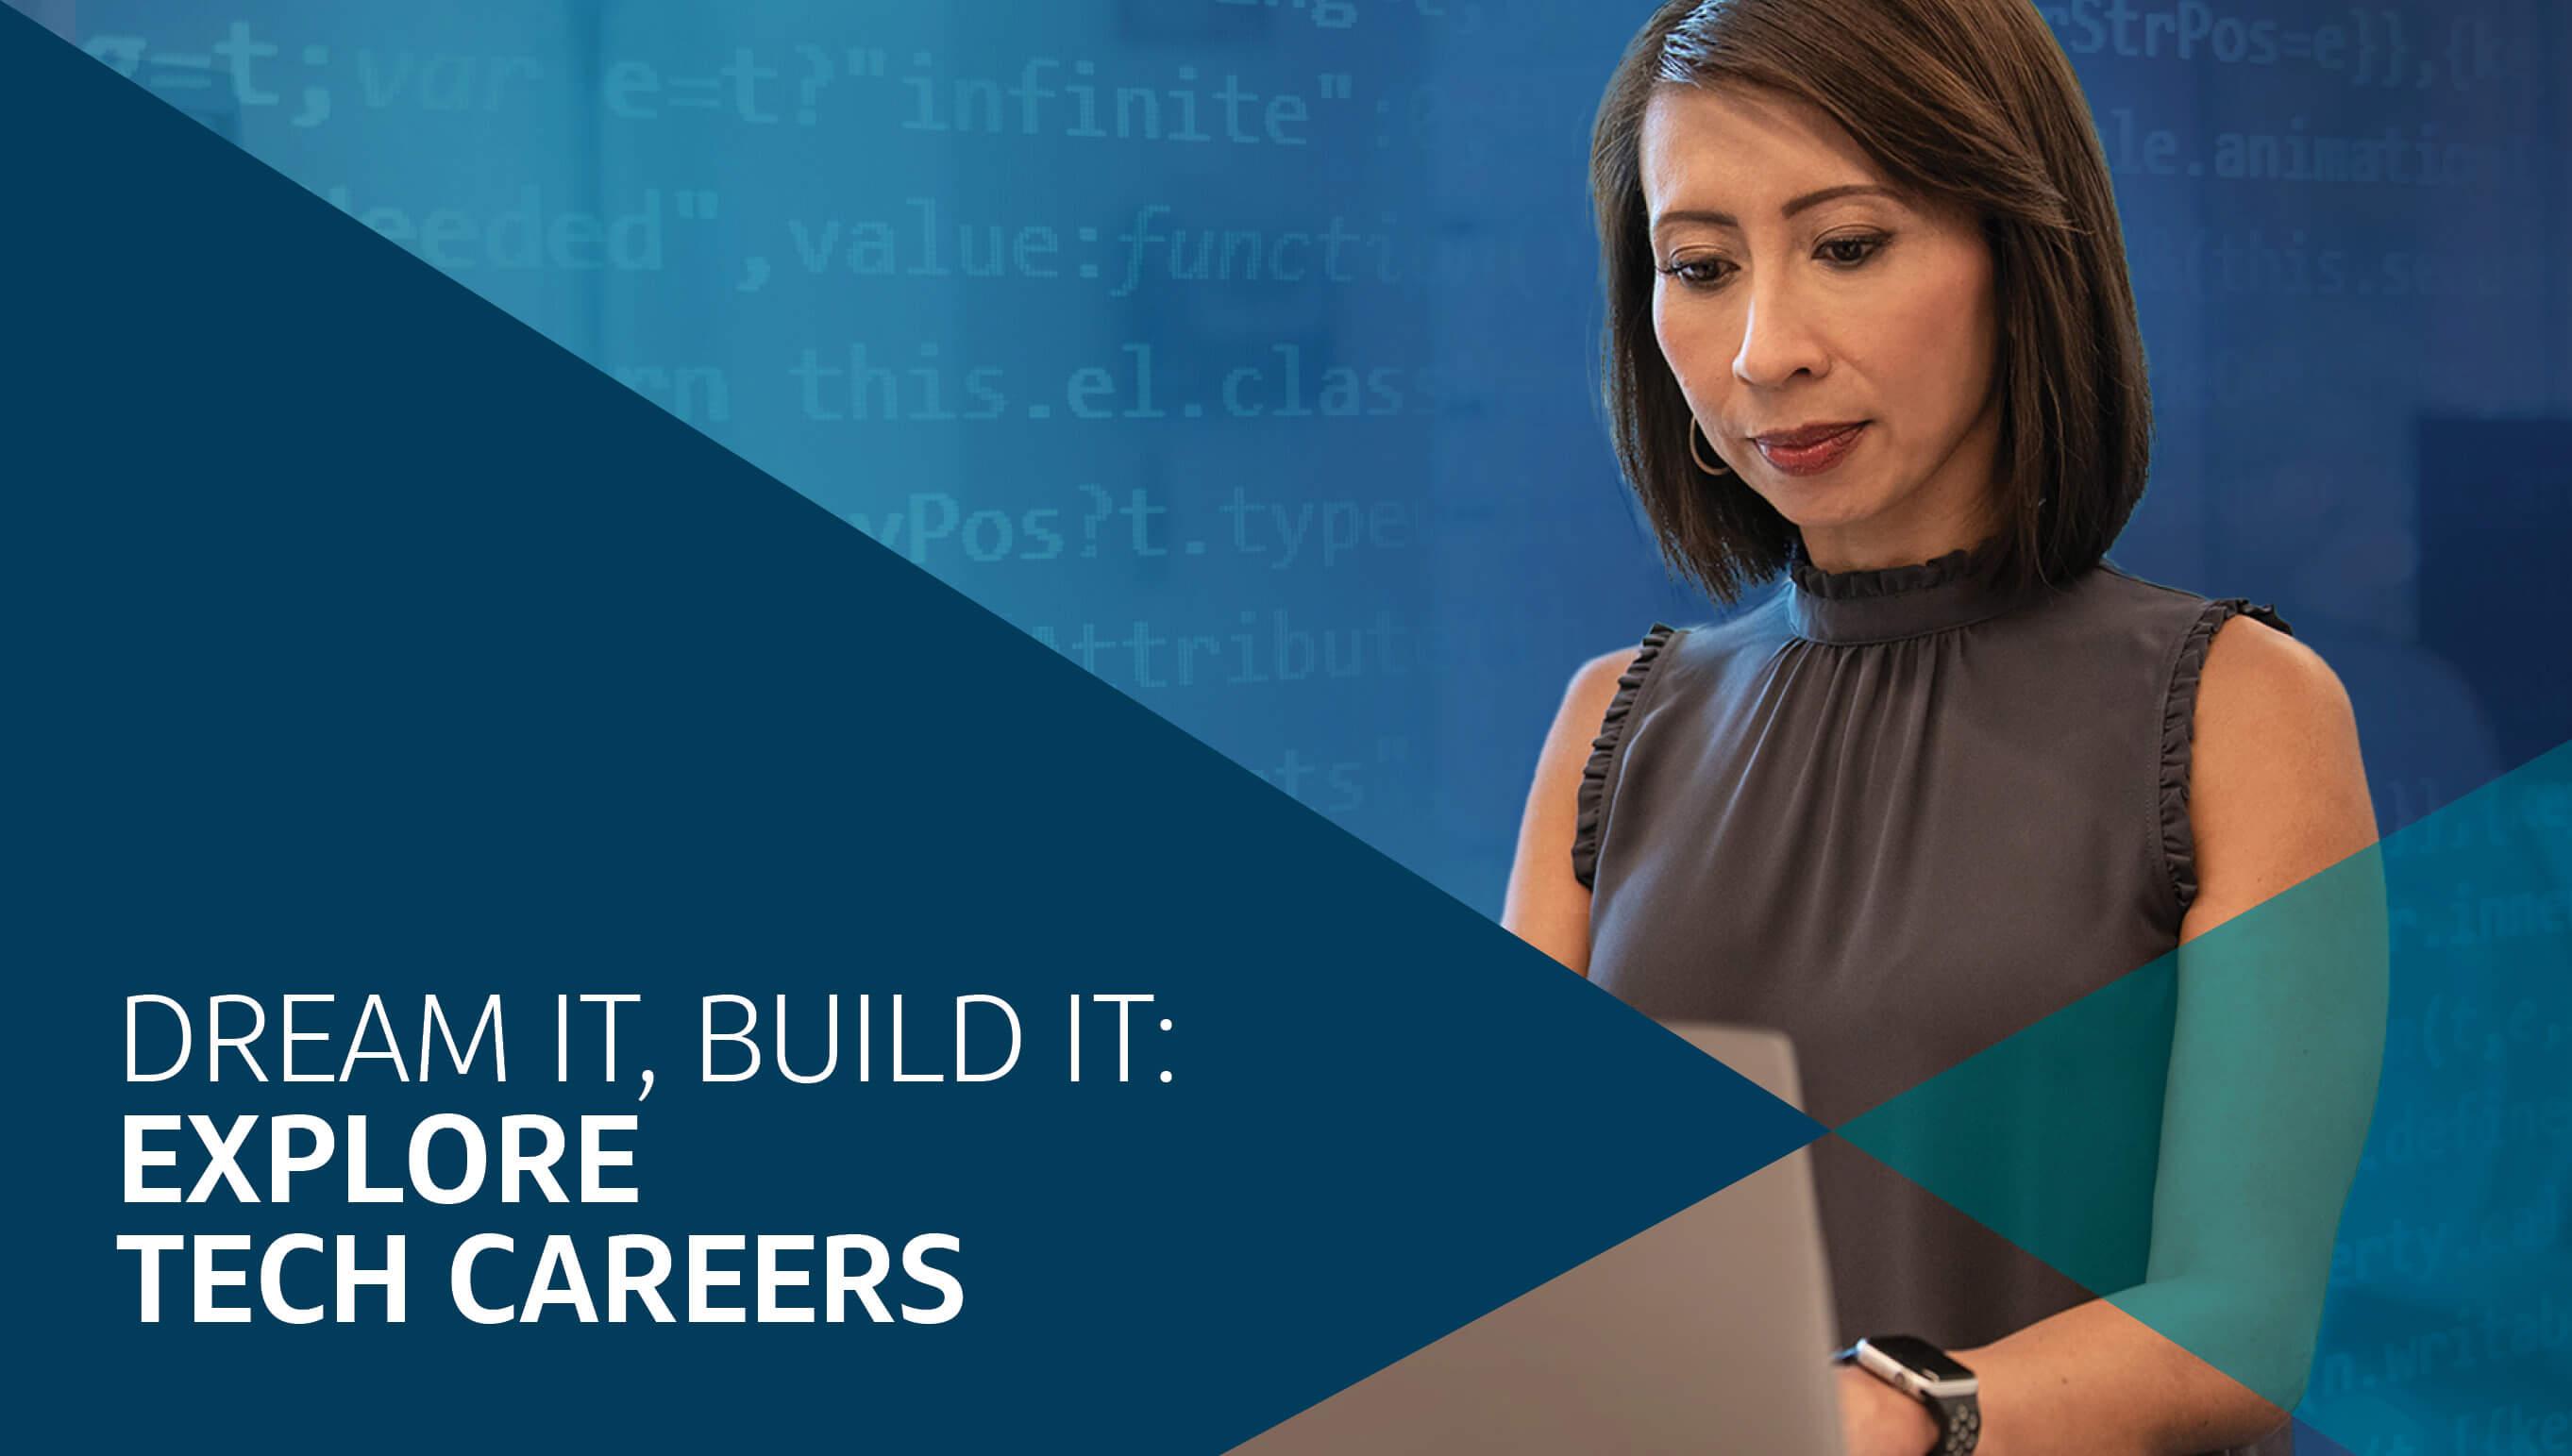 Dream it, Build it: Explore tech careers